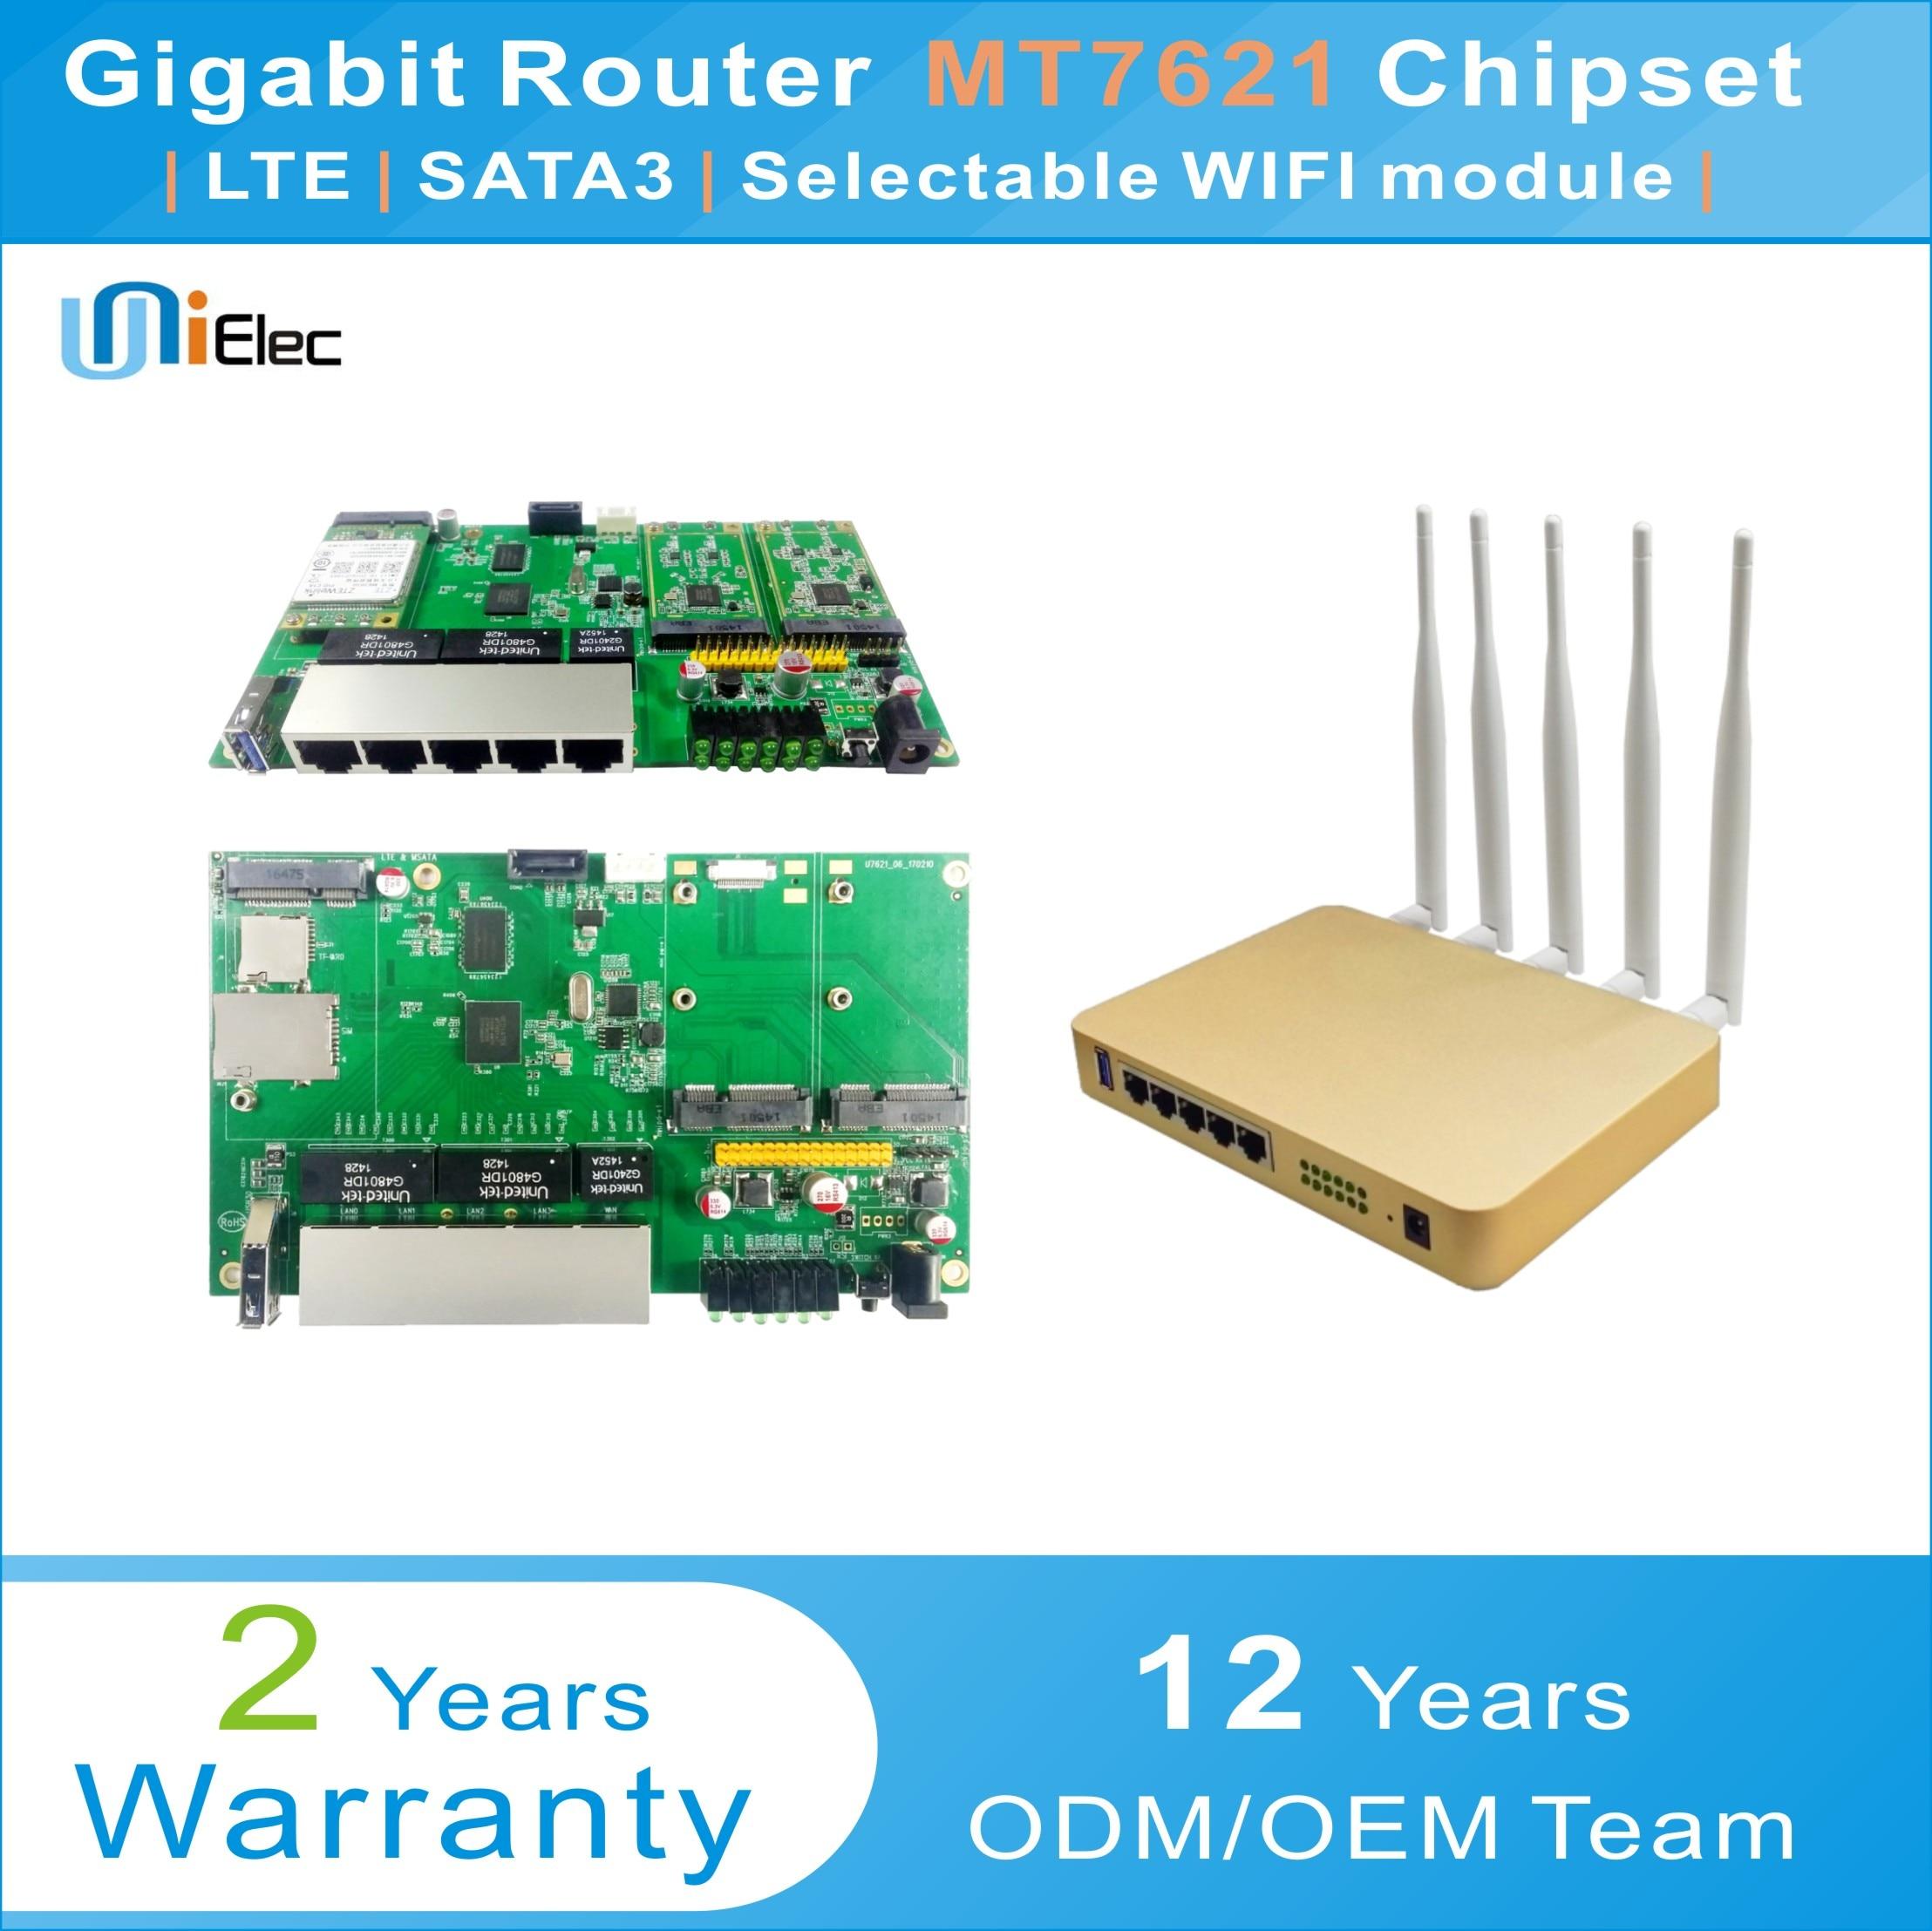 US $45 31 |MTK MT7621 Enterprise Wireless Router Sata LTE 4G WIFI OpenWrt  MT7603 MT7612 Gigabit MT7621A chipset Sim Card PCBA ODM OEM Board-in